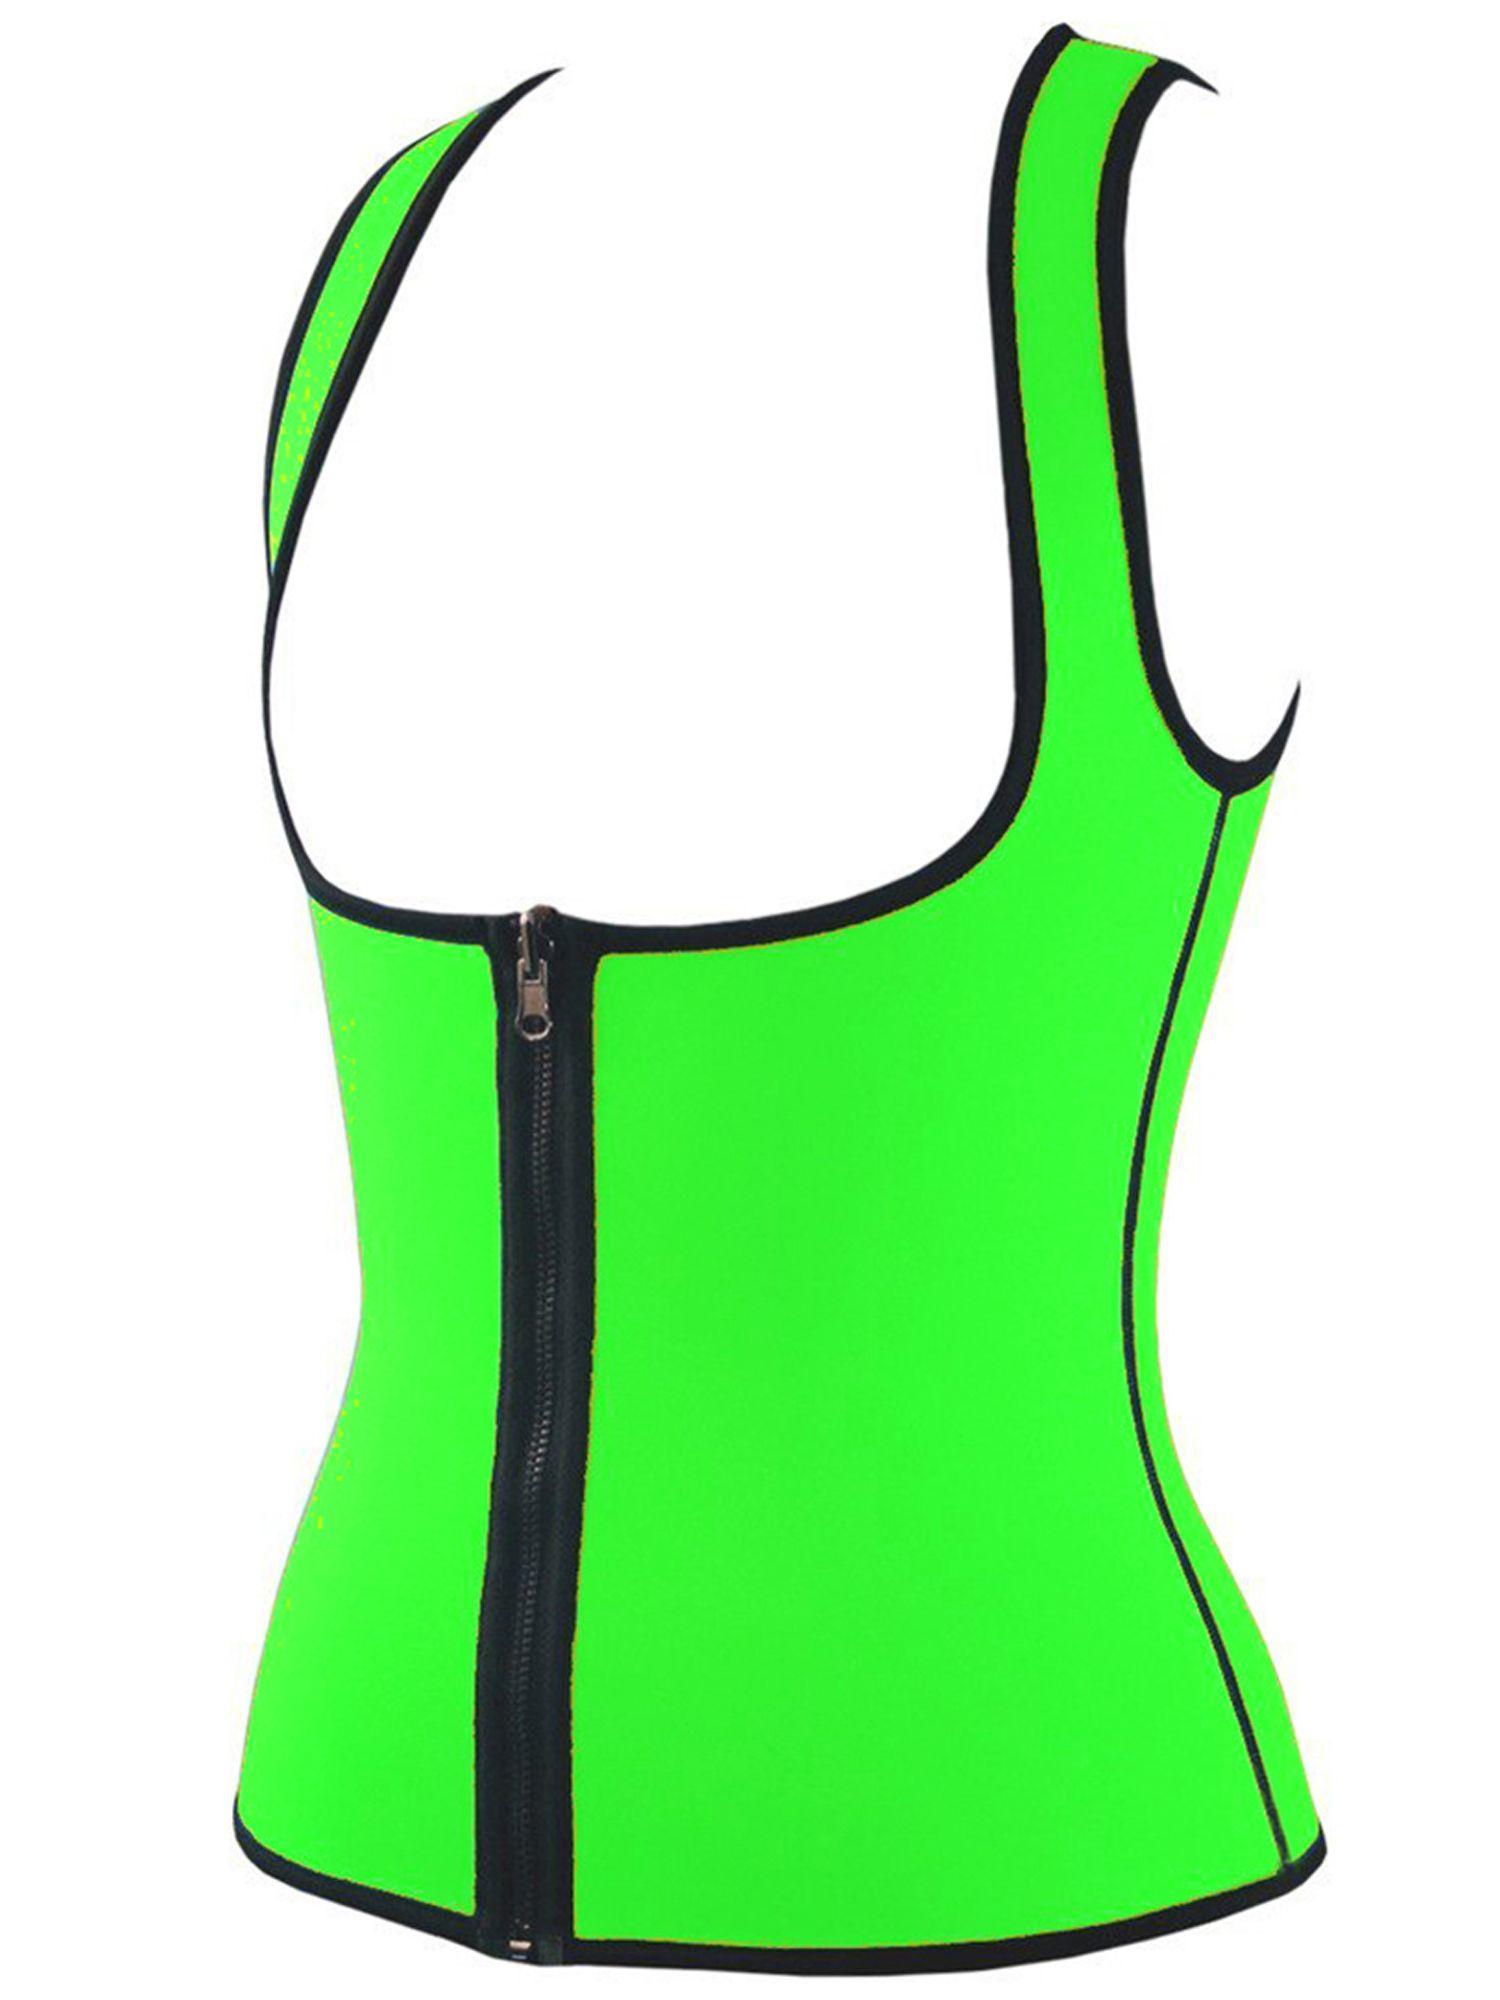 684da6940b SAYFUT Women s Shapewear Slimming Vest Waist Trainer Body Shaper Corset Hot  Sweat Neoprene Weight Loss Tank Top Tummy Control Sauna Suit Trainer